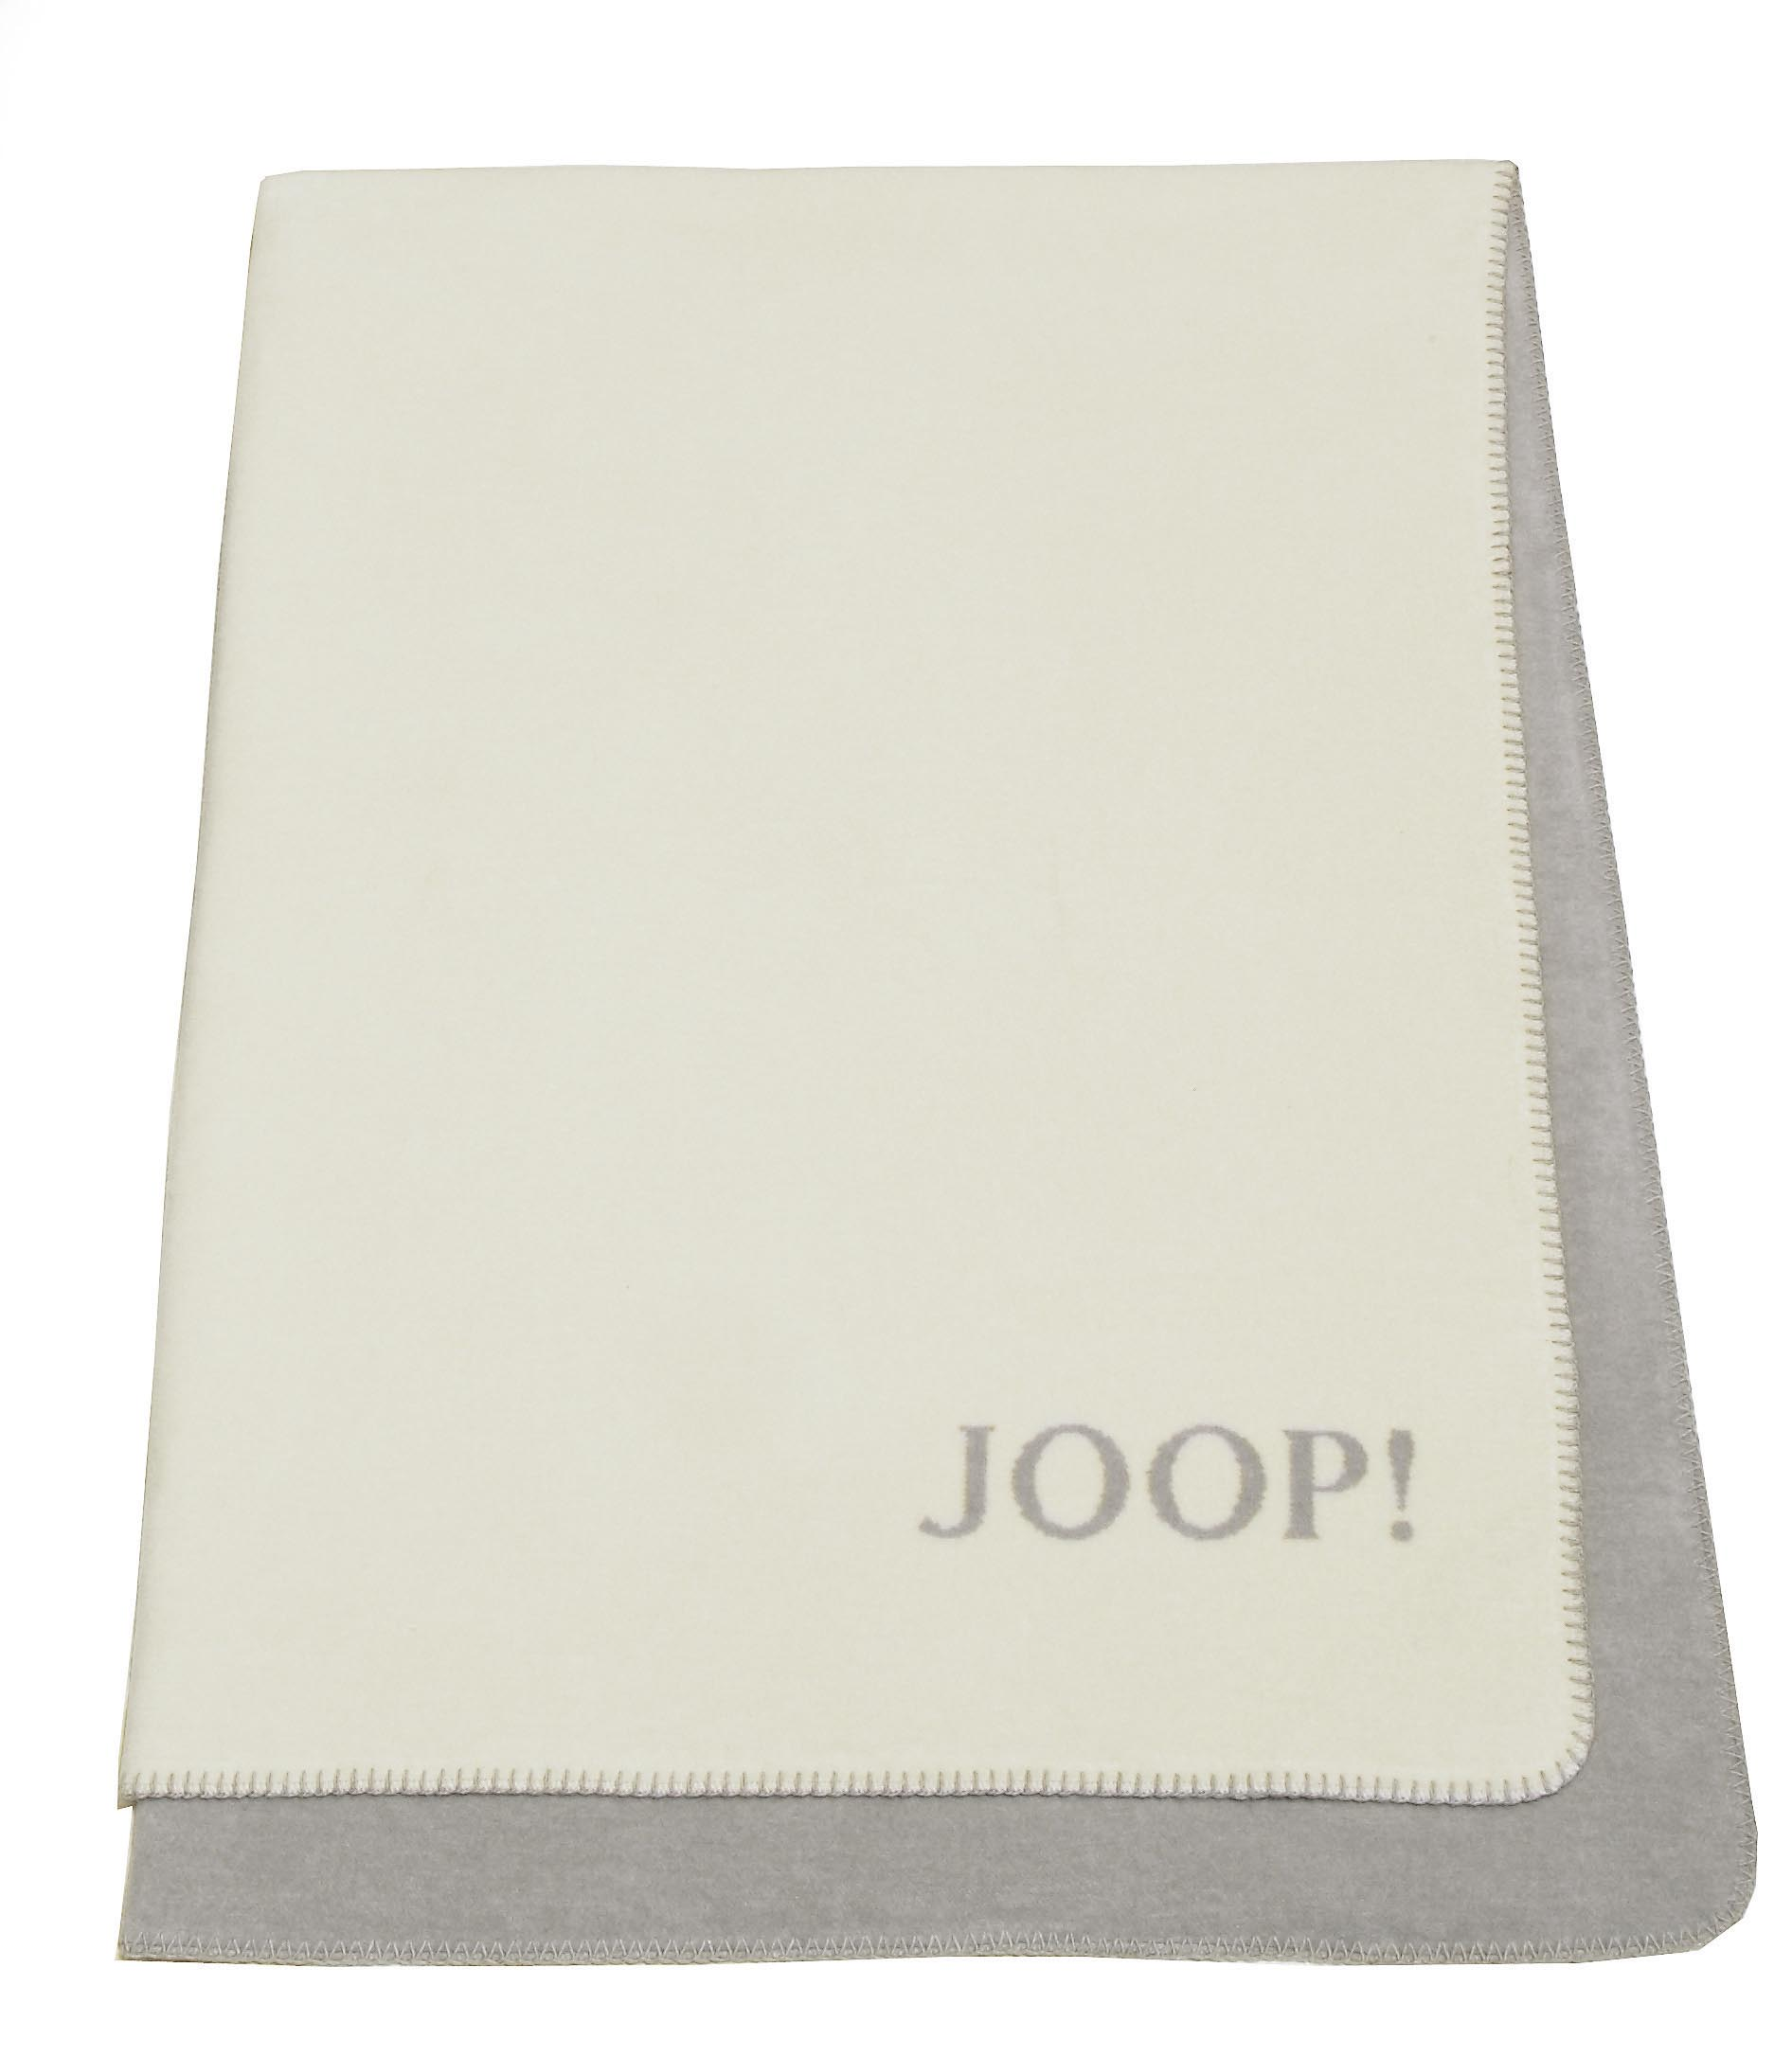 585615 joop trend decke wolldecke kuscheldecke ebay. Black Bedroom Furniture Sets. Home Design Ideas